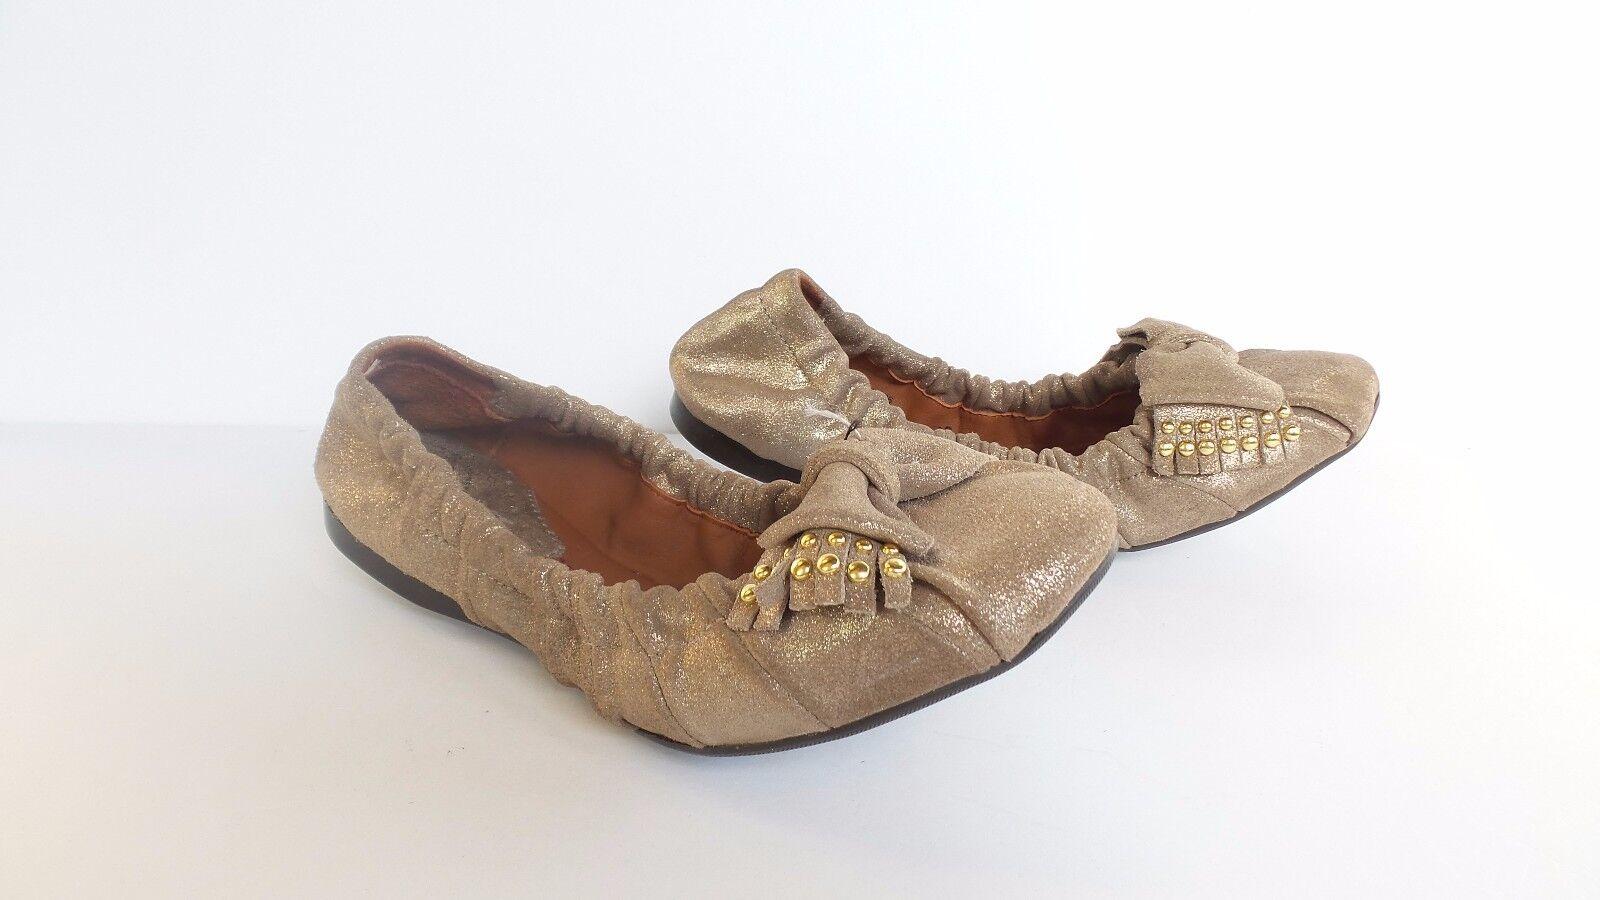 NEW Johnston & Murphy Women's Flexible Ballet Flats LEATHER Elastic Gold Shoes